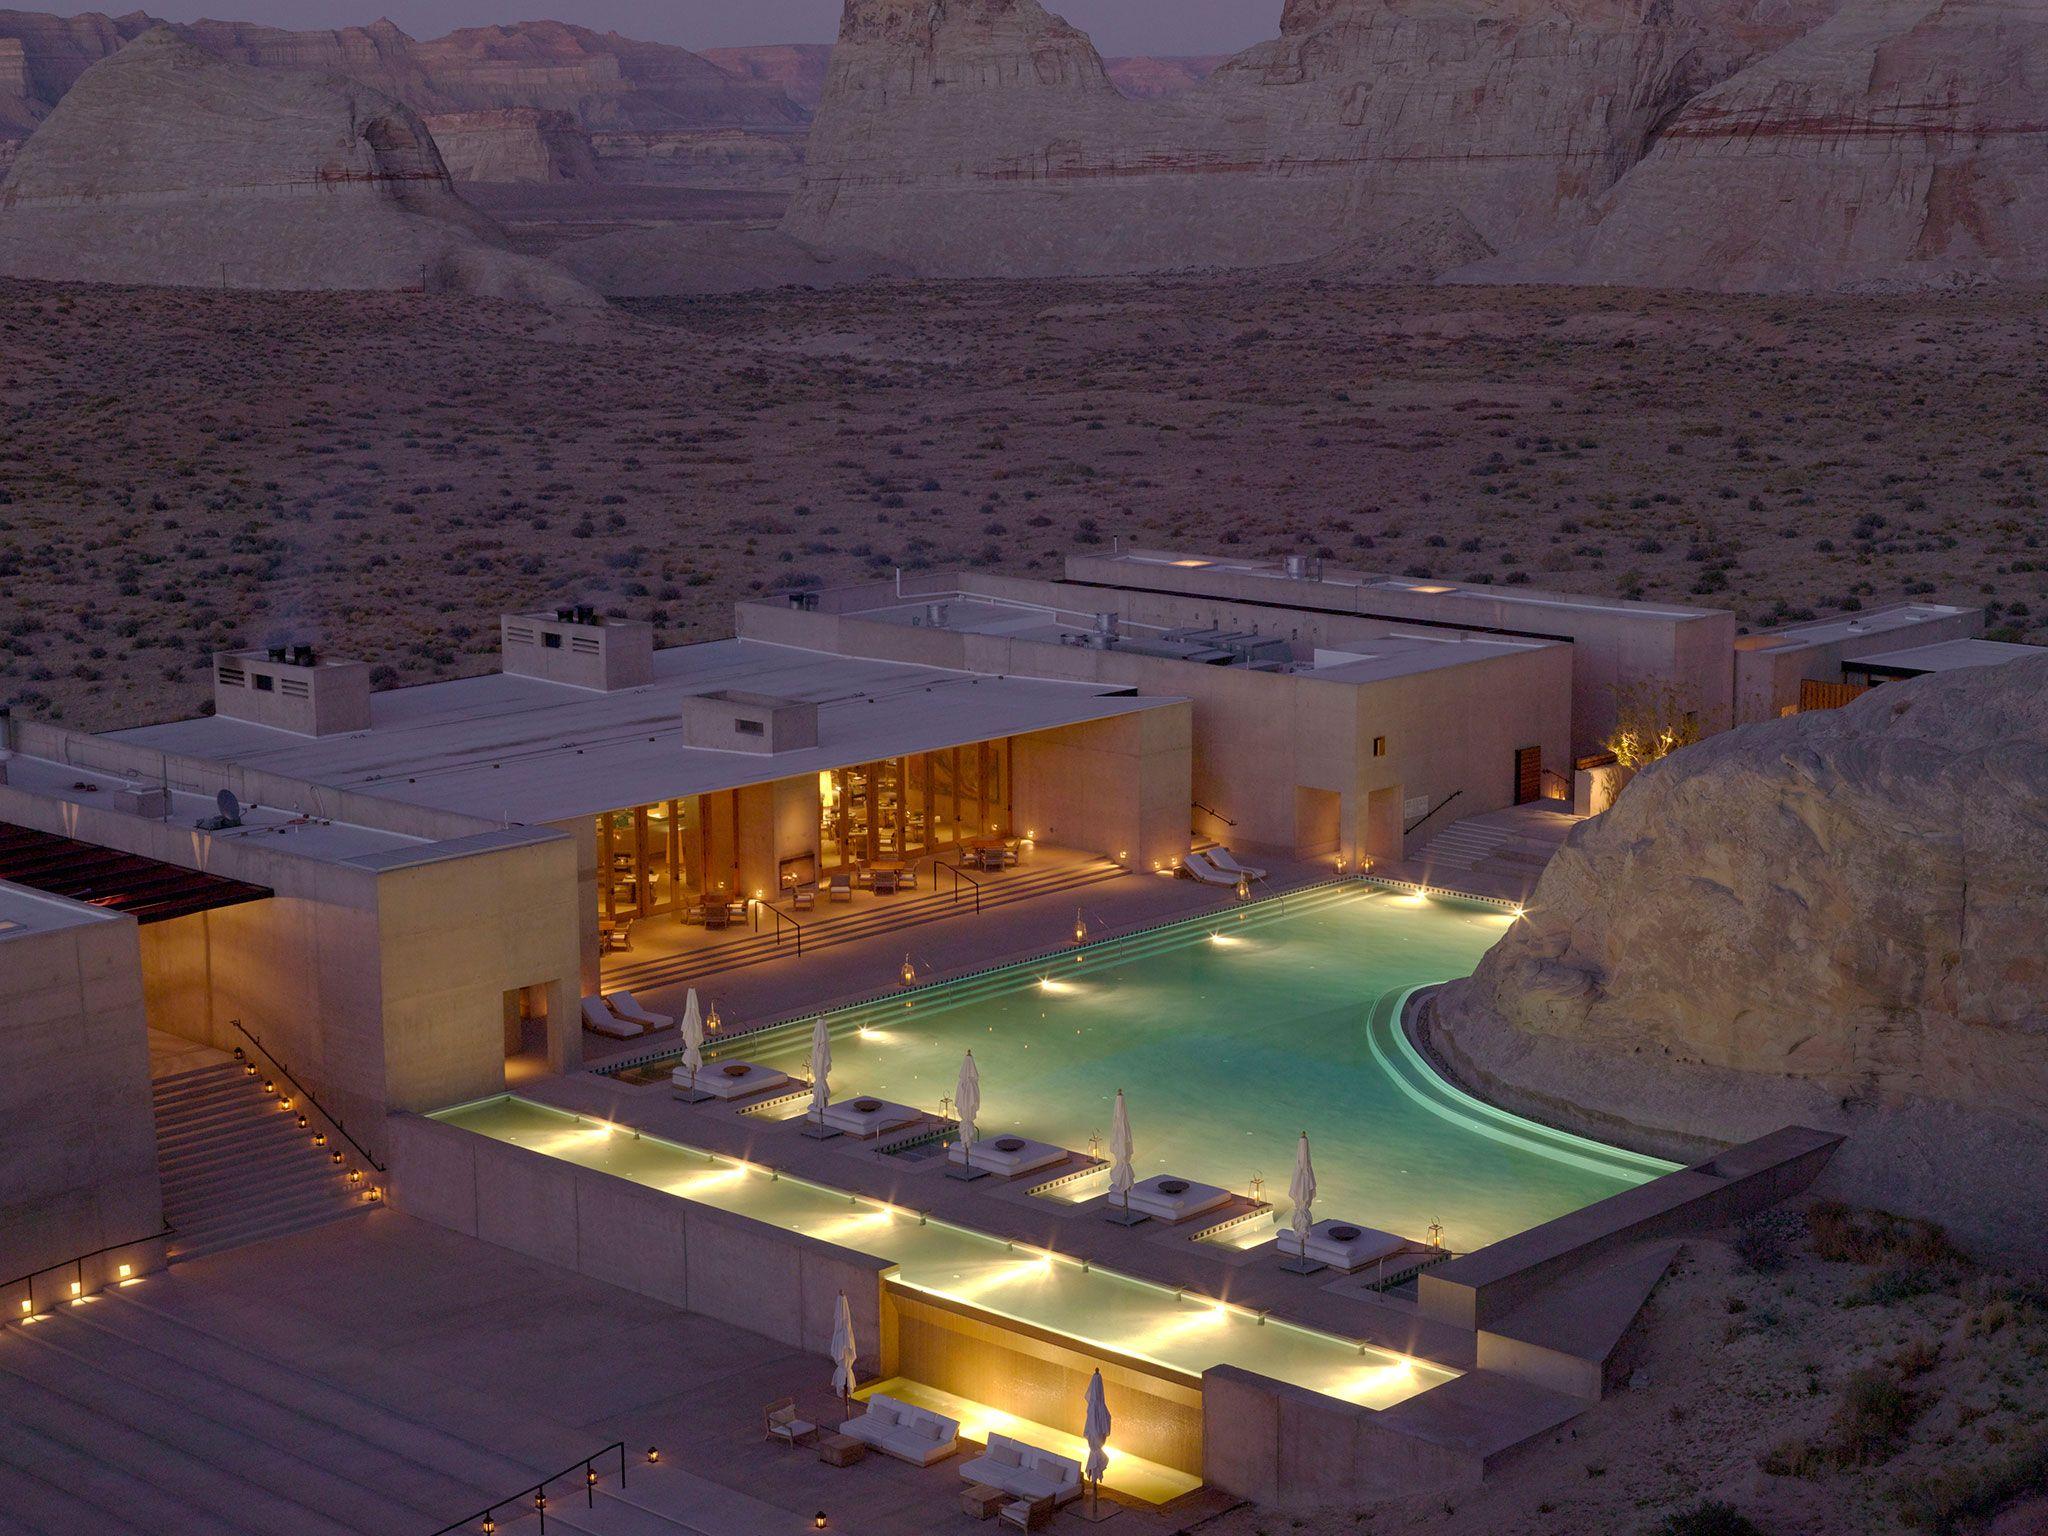 Amangiri canyon point utah amagiri is a luxury resort and spa hidden away on 600